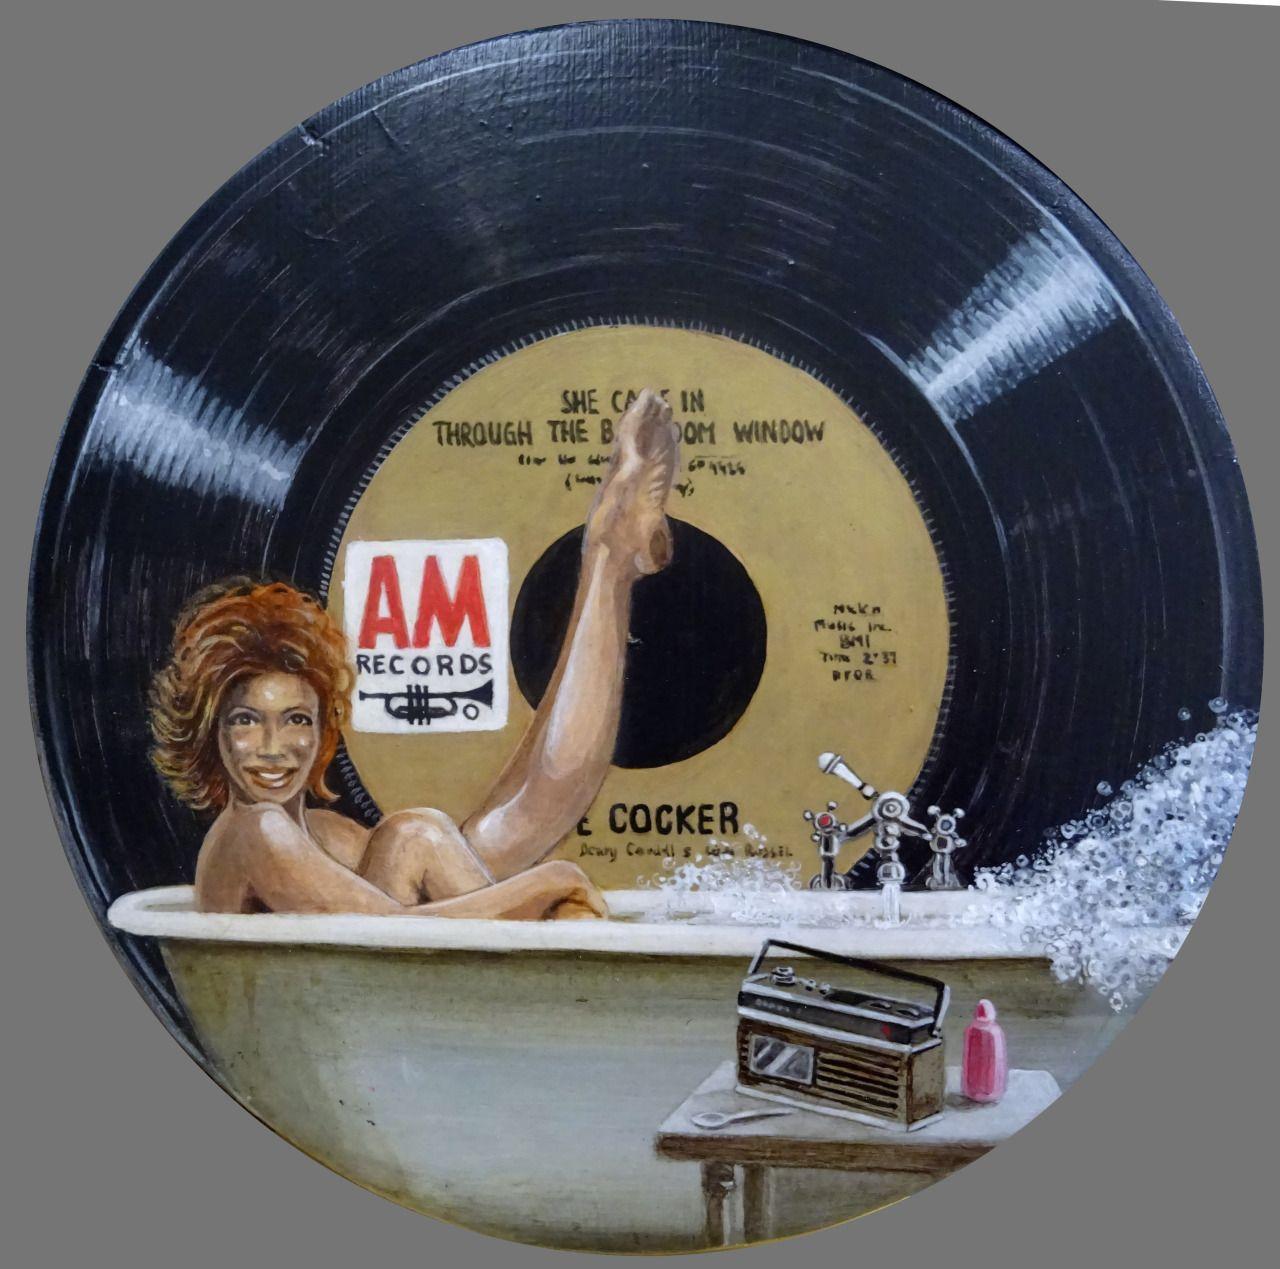 Vinylespassion Joe Cocker She Came In Through The Bathroom Window In February Vinyl Art Par Jacques Pui Vinyl Record Art Vintage Vinyl Records Vinyl Art